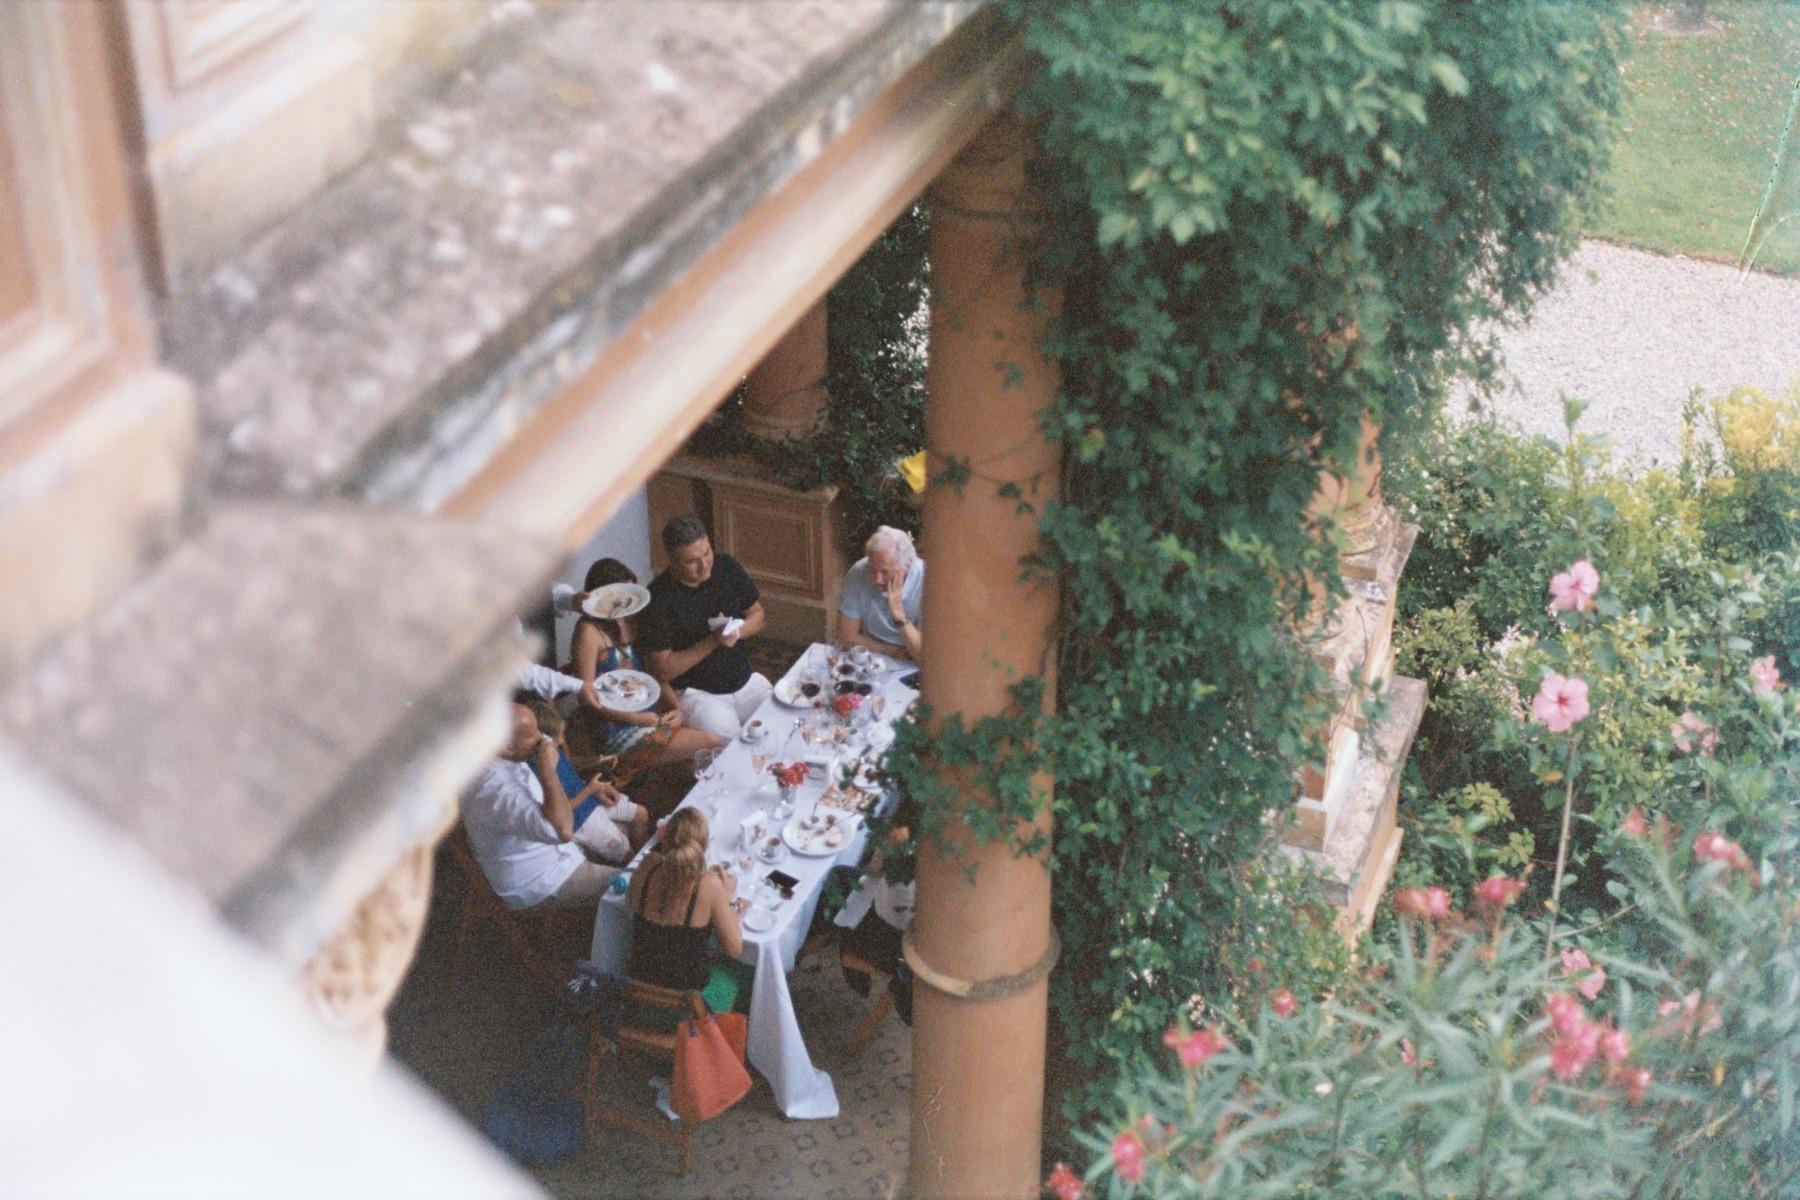 group of people in the garden enjoying dinner